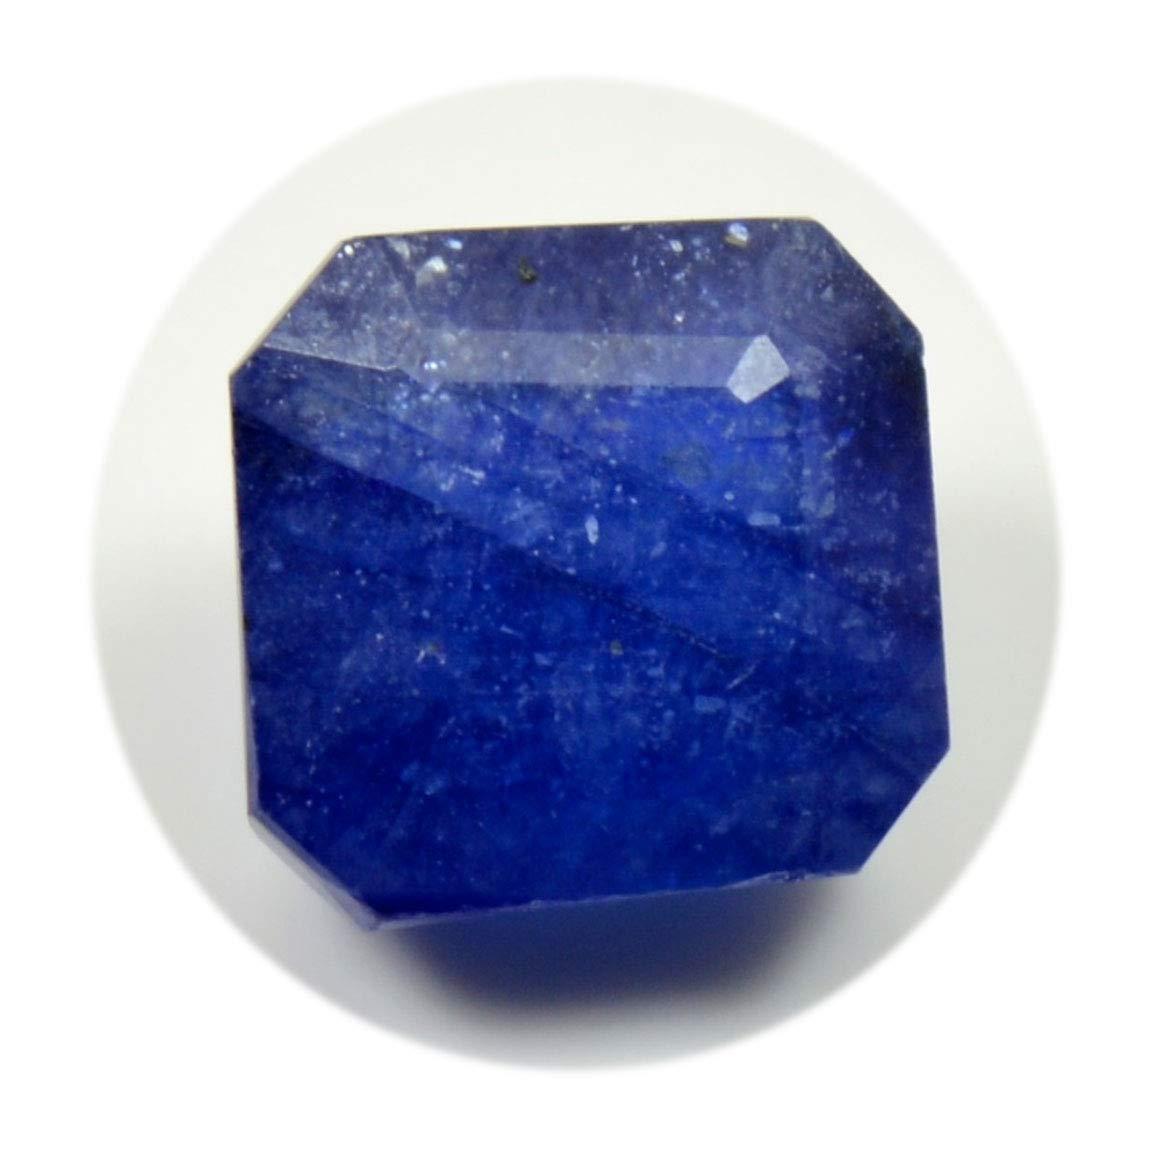 Natural Blue Sapphire Gemstone 8 Carat Asscher Shape September Birthstone at Wholesale Rate Loose Stone Gemsyogi 55LOOGEMBSA20